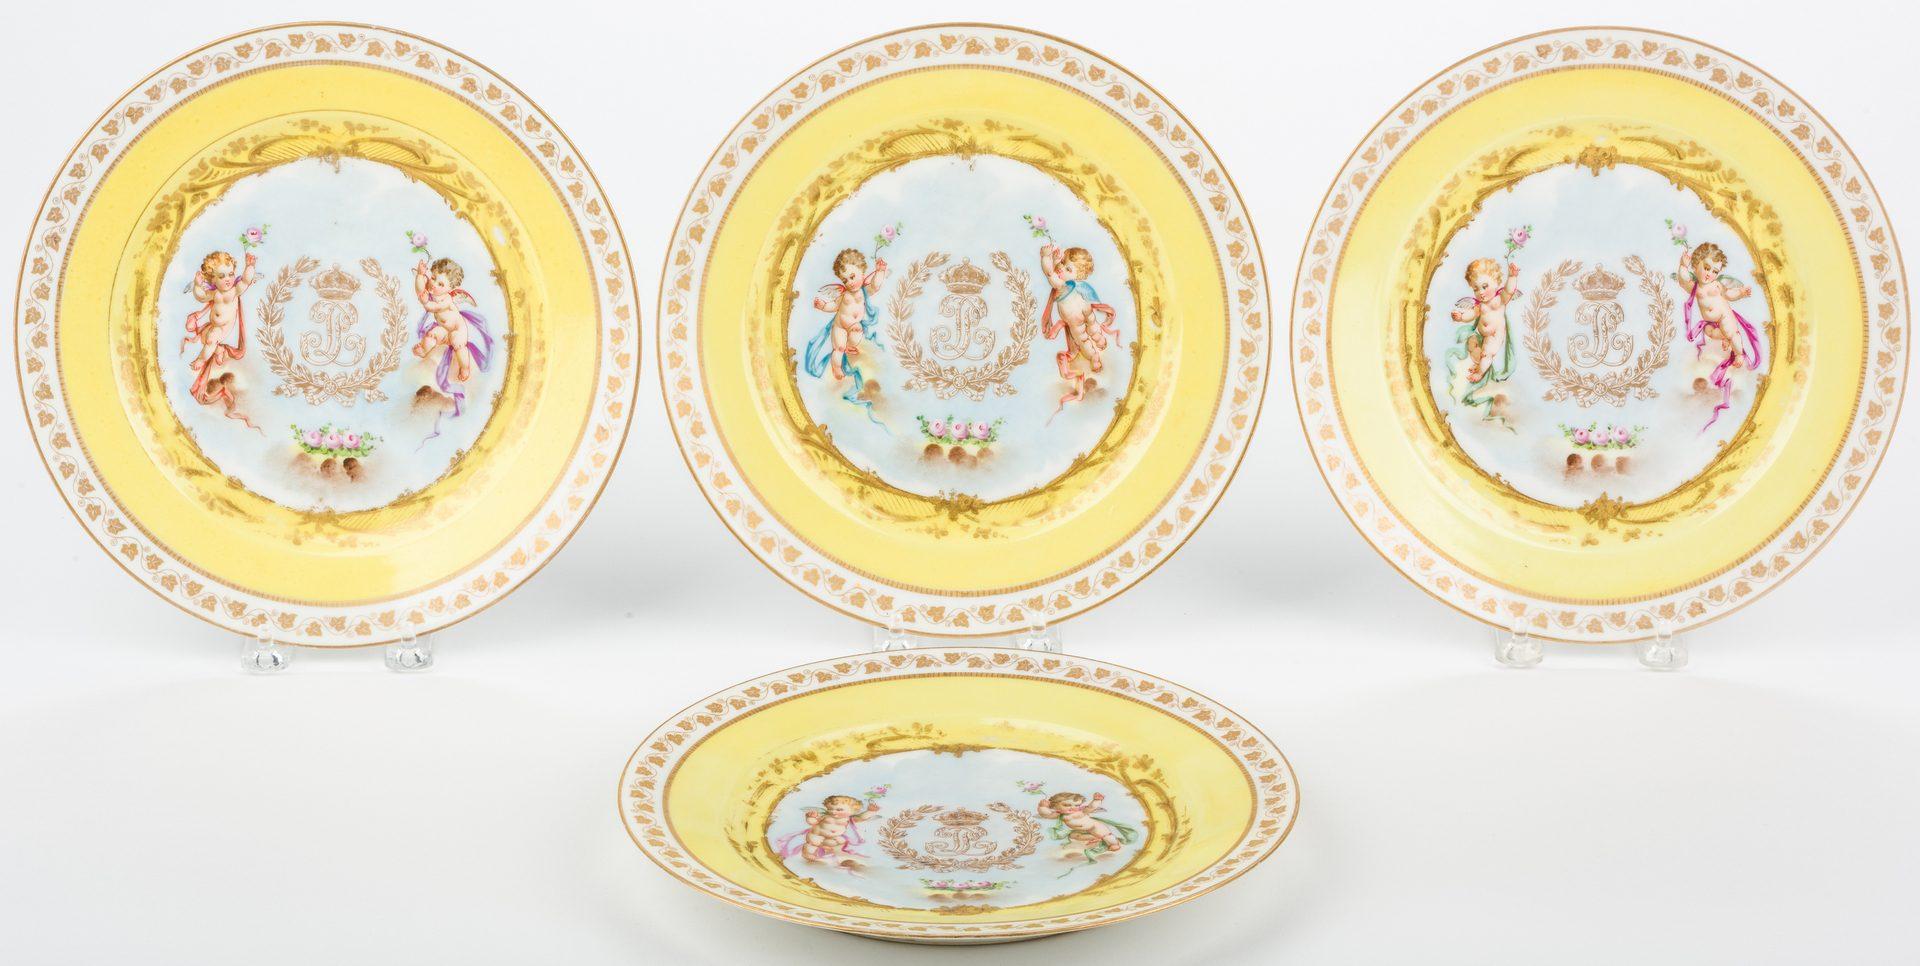 Lot 326: Sevres Chateau Tuileries Plates & Fruit Bowl, 5 items